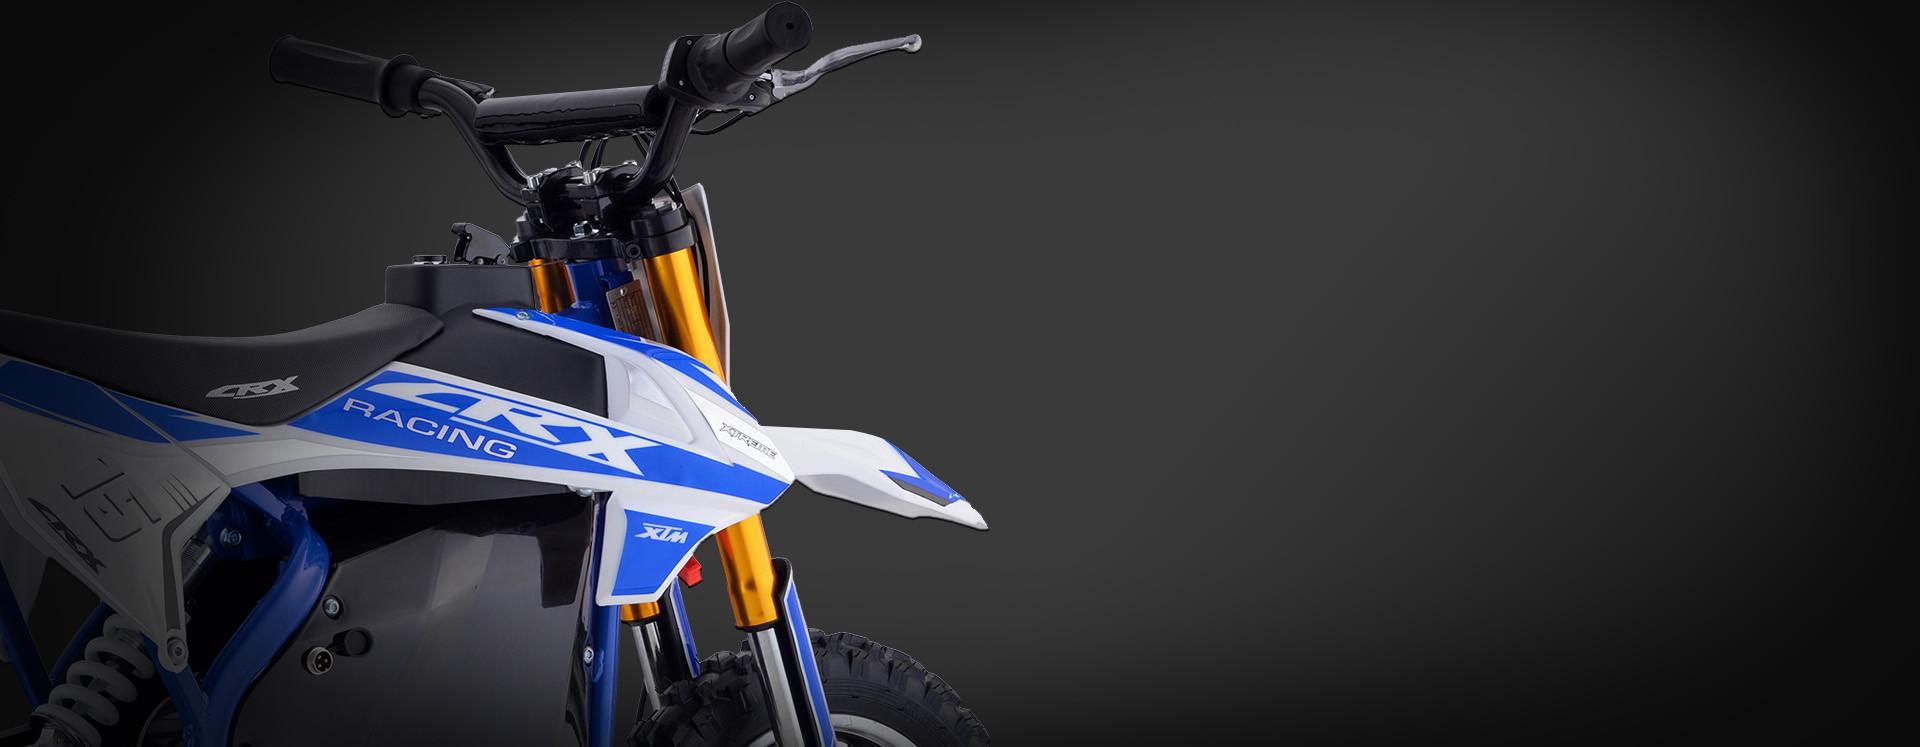 XTM CRX 36V 500W ELECTRIC DIRT BIKE BLUE